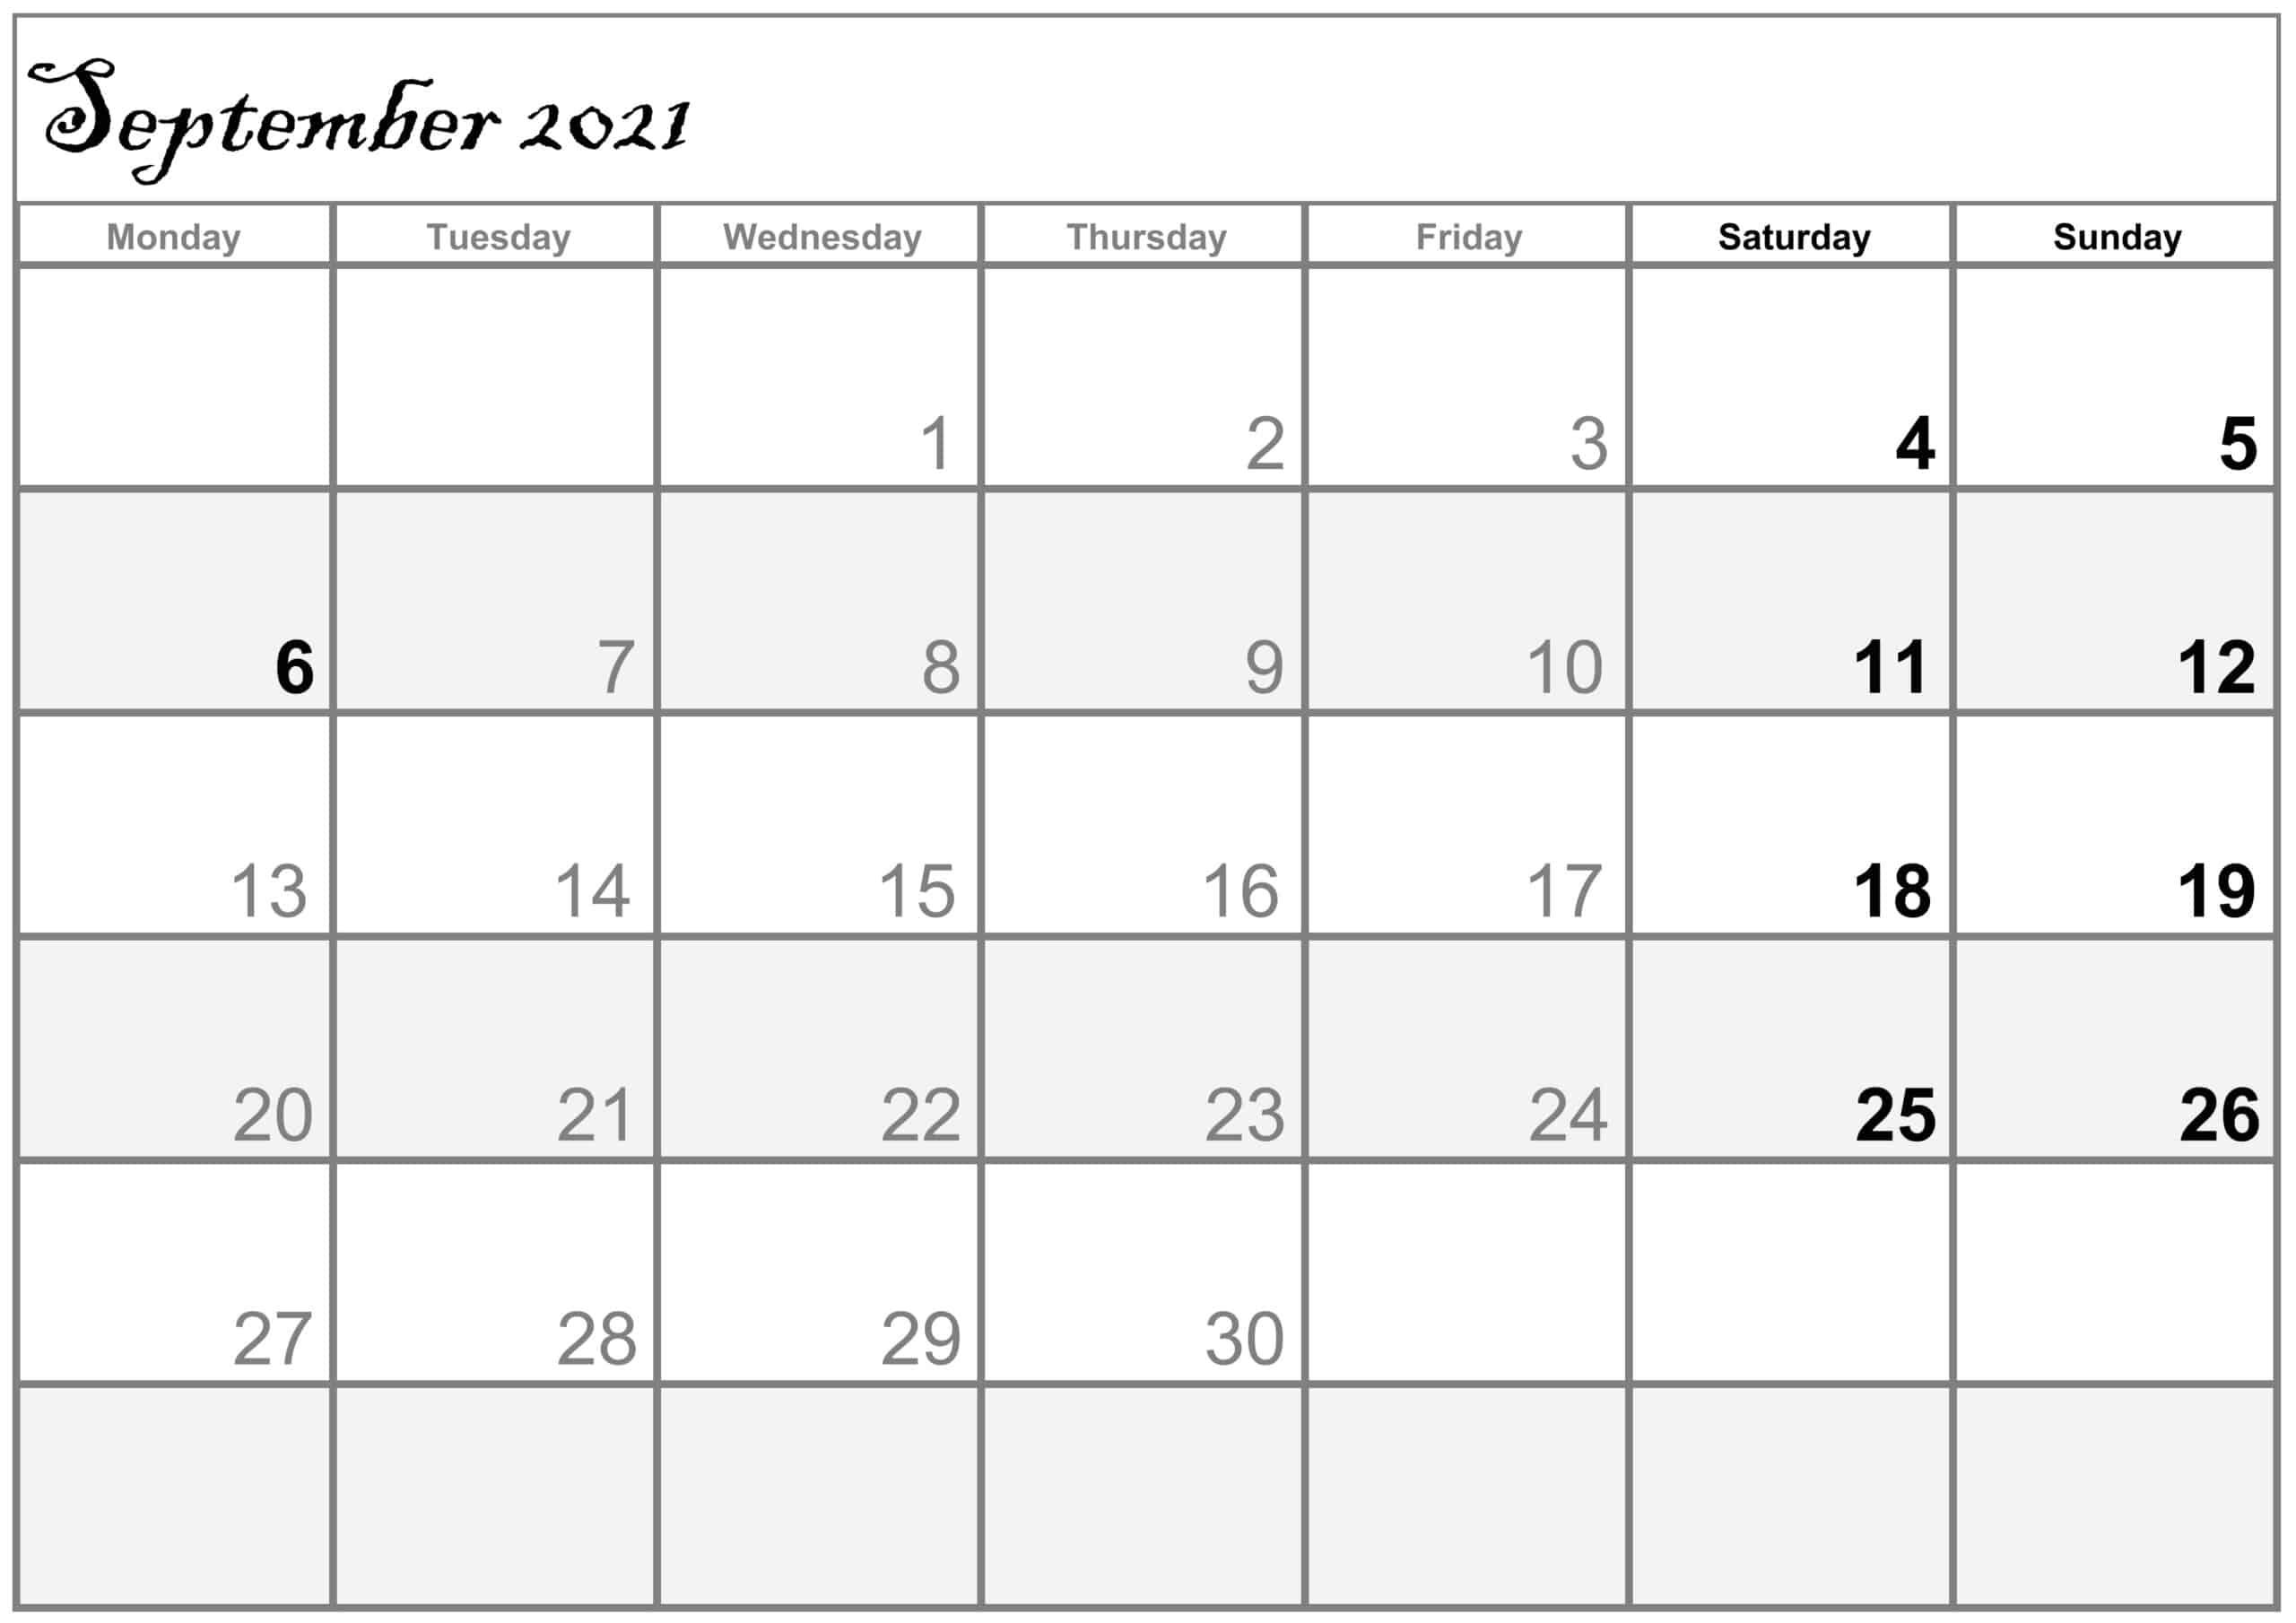 Excel September 2021 Calendar free